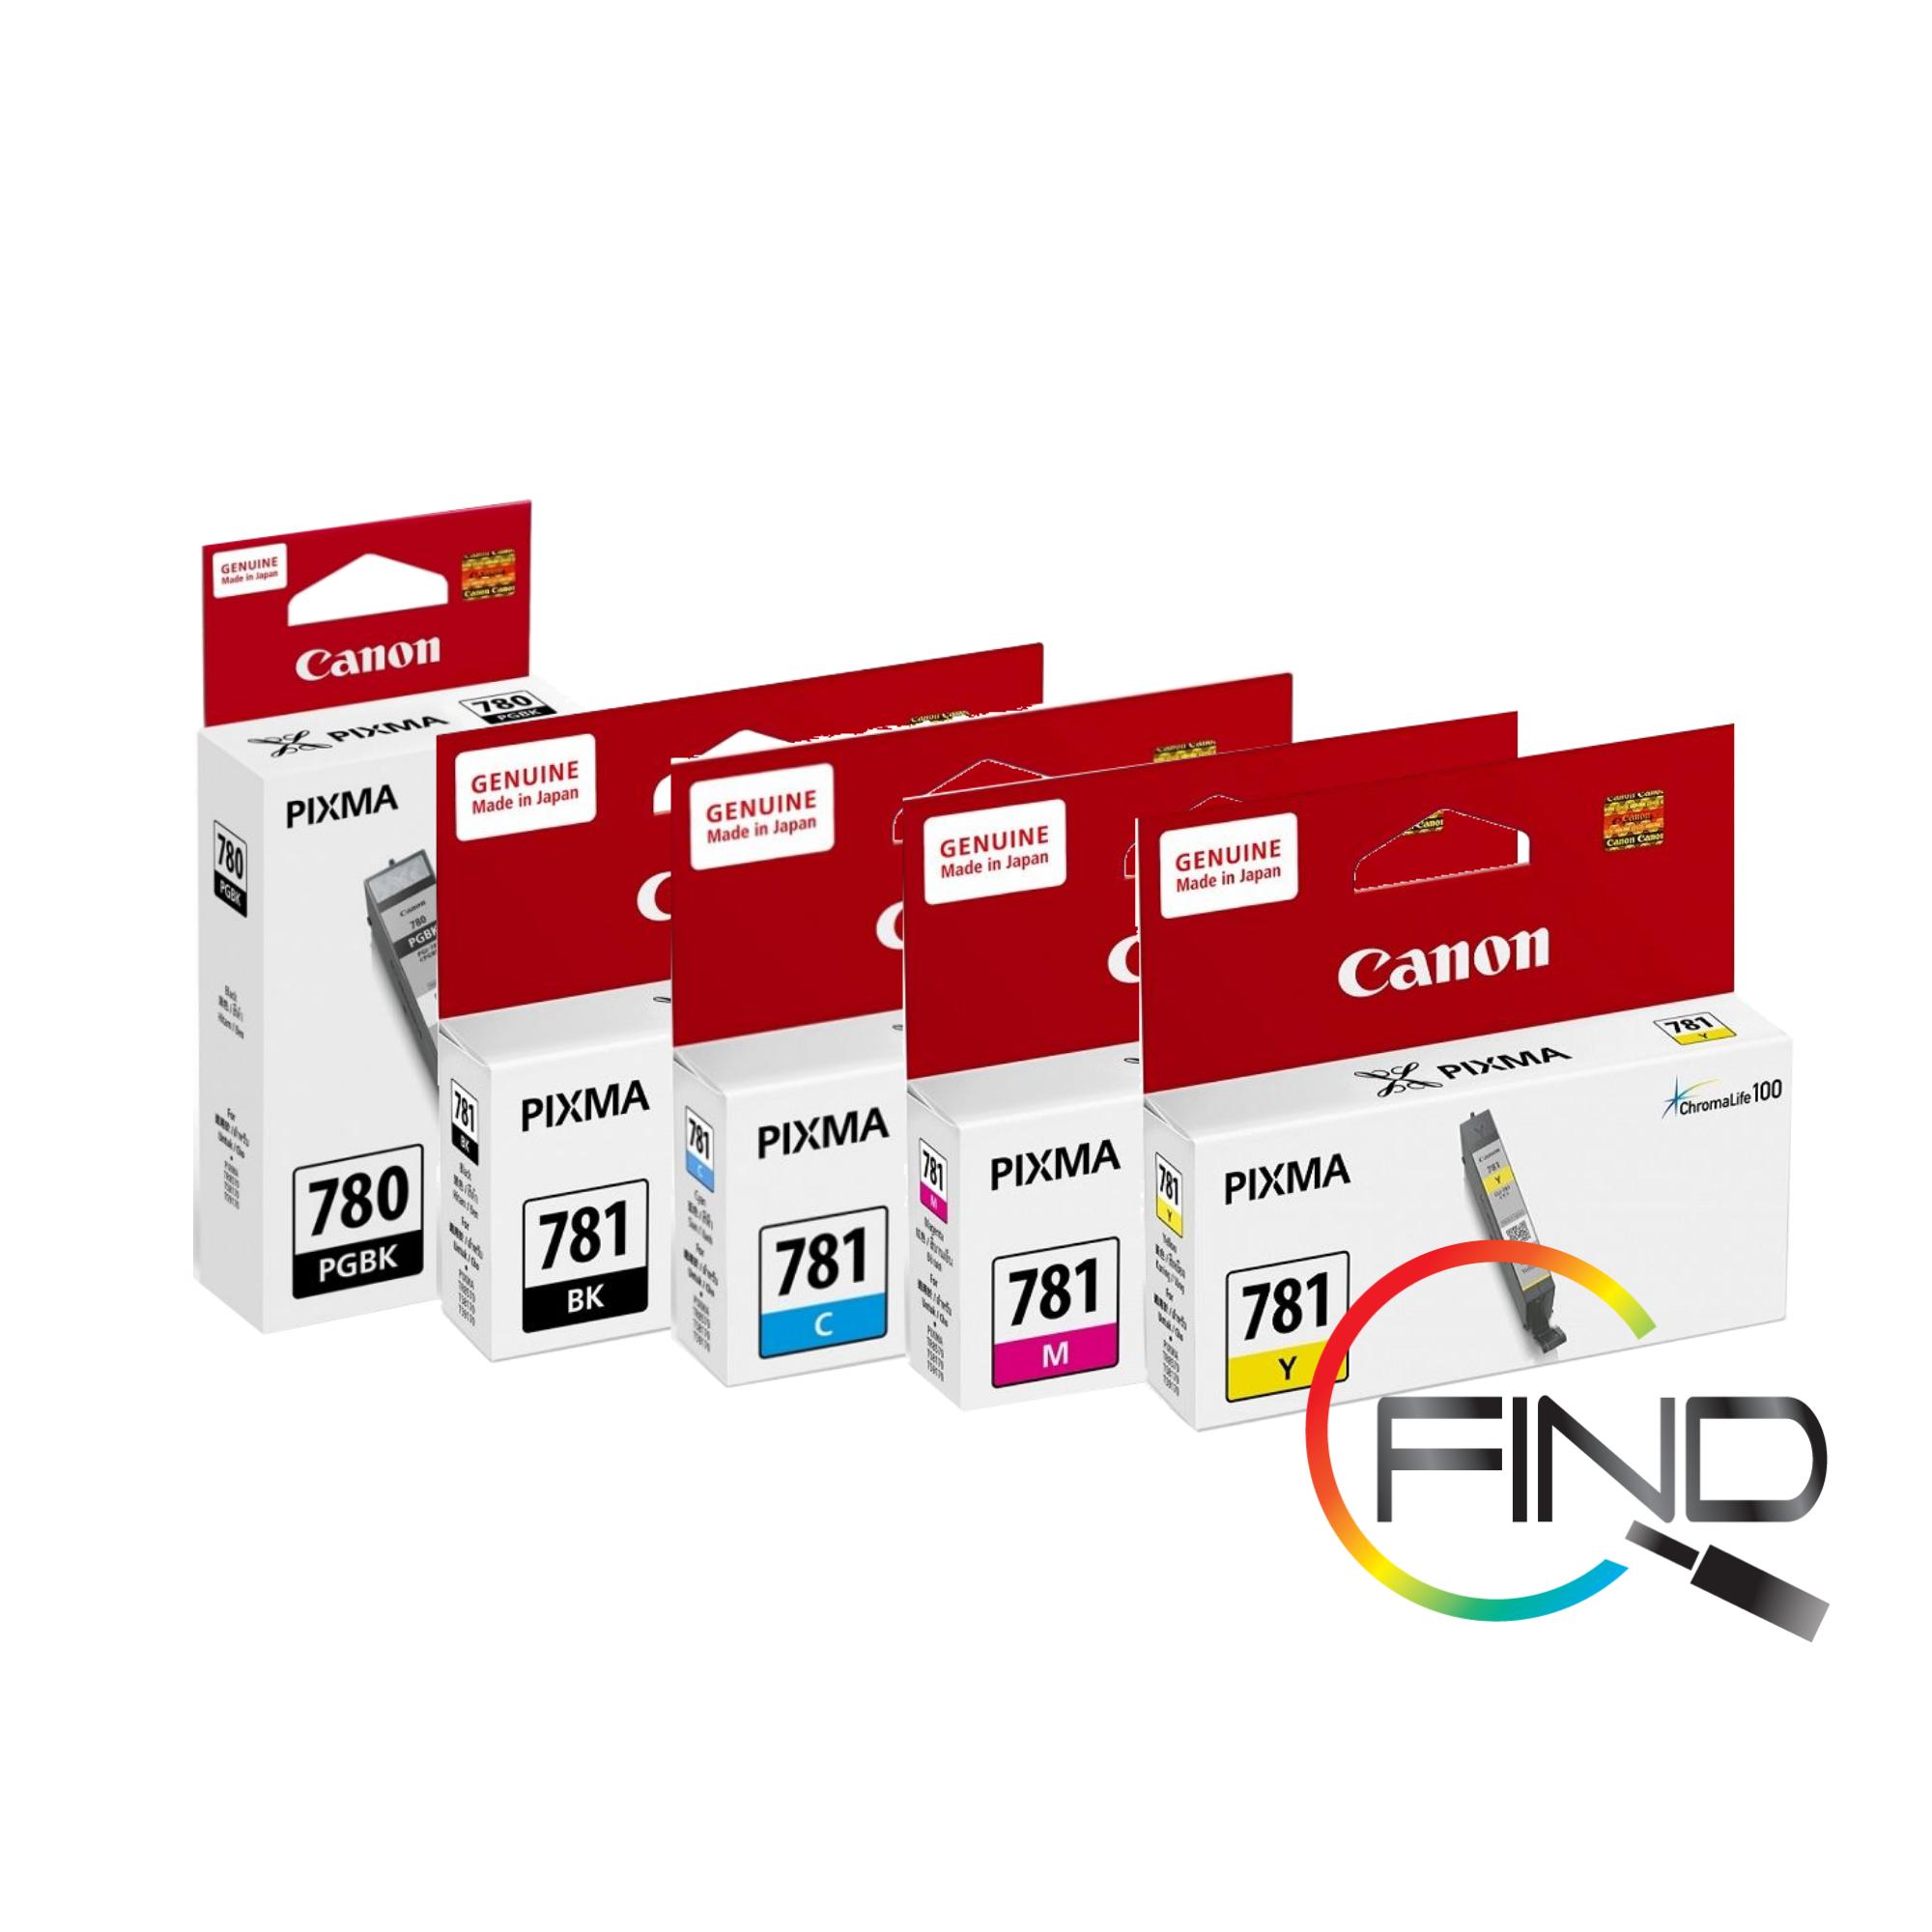 CANON PGI-780 & CLI-781 NORMAL SET CARTRIDGE (PGI-780+CLI781BK+C+M+Y) for TS707, TS6370/TS9570, TR8570 Printer